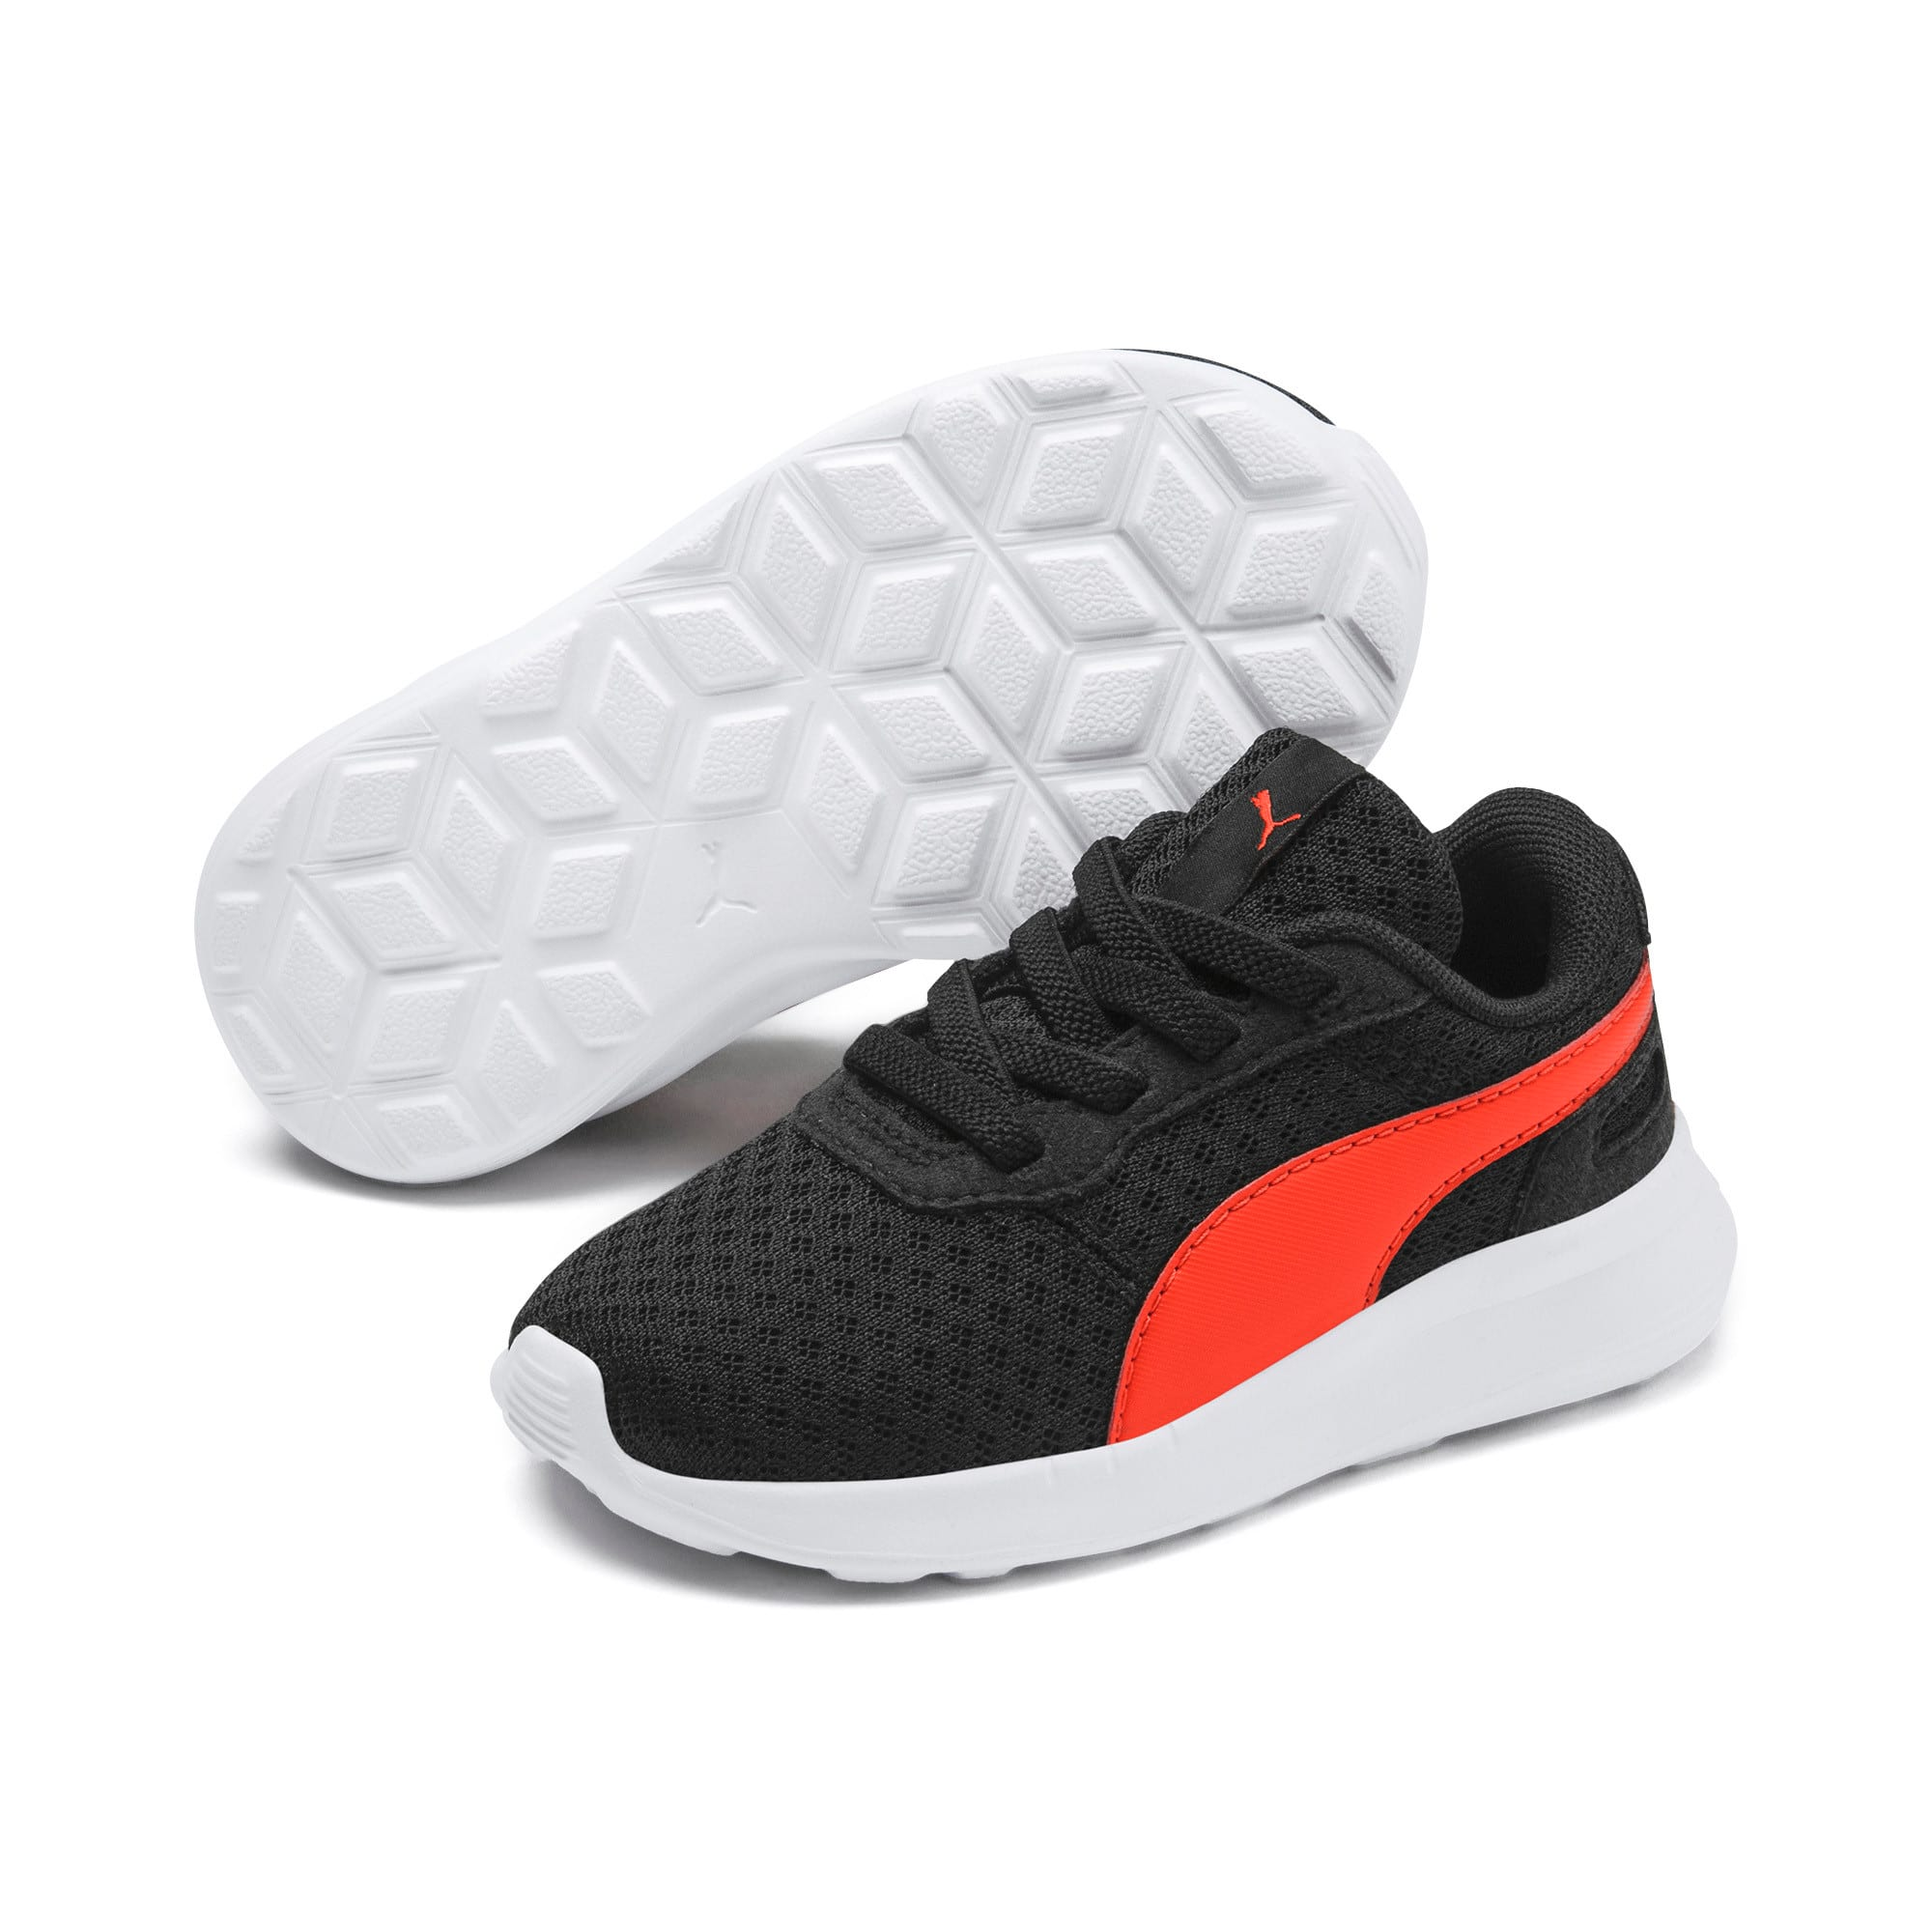 Thumbnail 2 of ST Activate AC Toddler Shoes, Puma Black-Cherry Tomato, medium